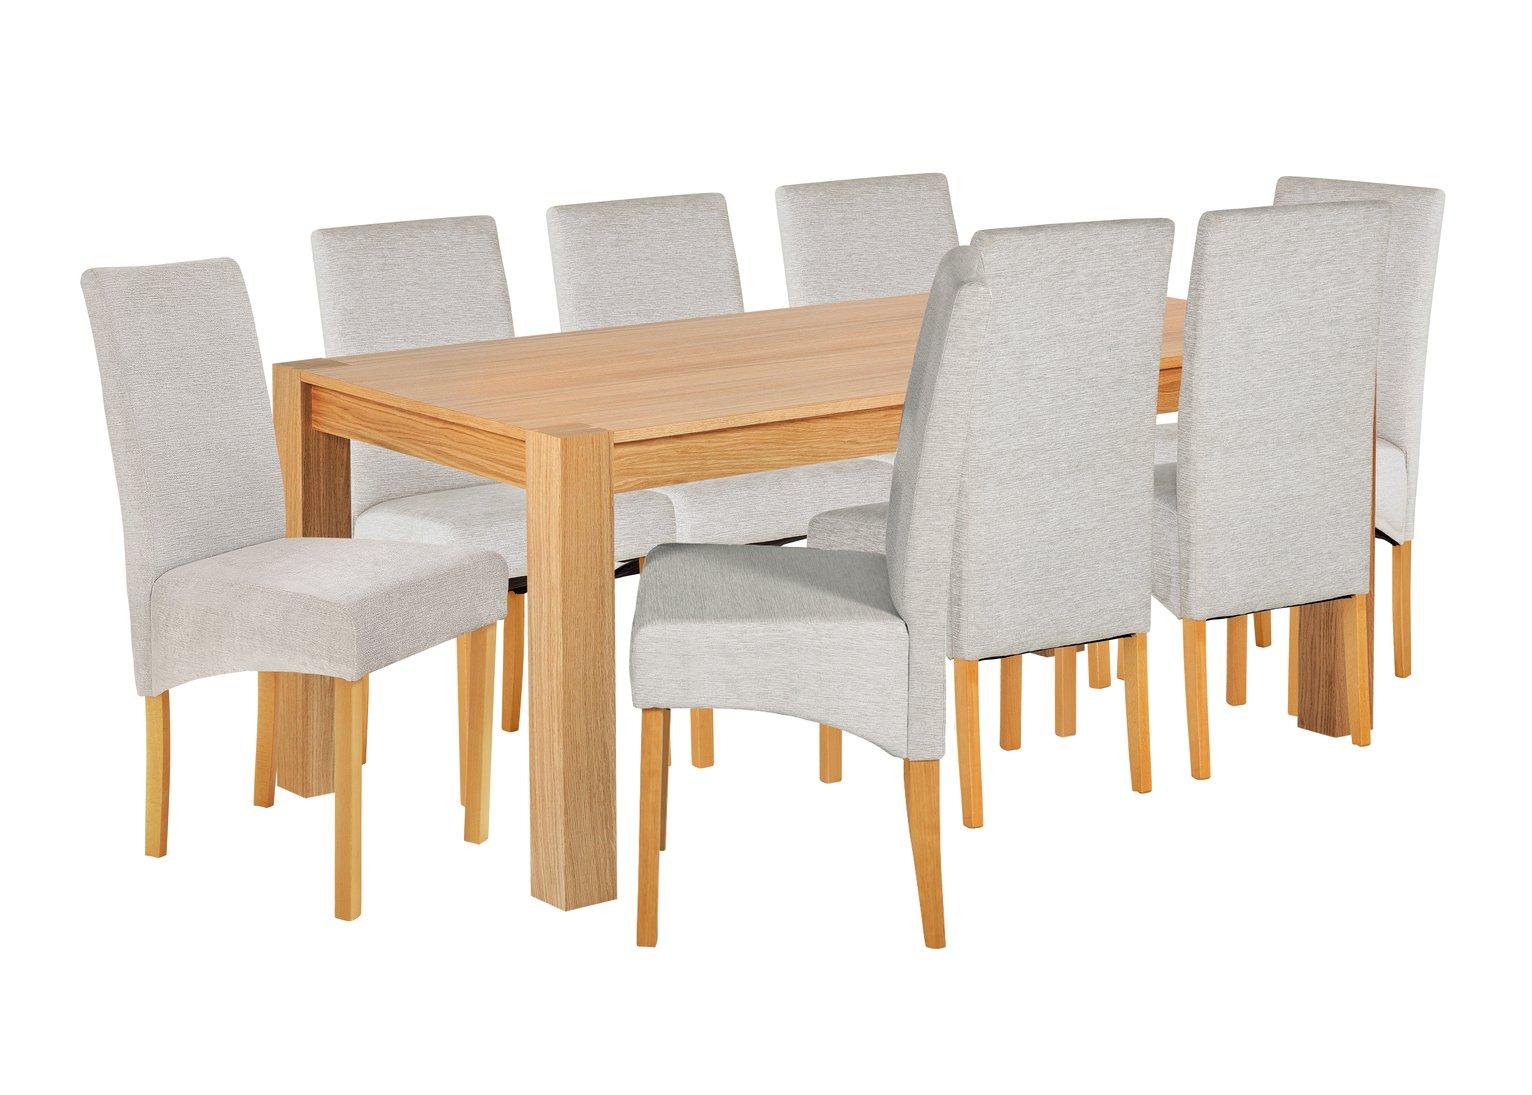 Heart of House Alston Oak Veneer Table & 8 Chairs - Grey